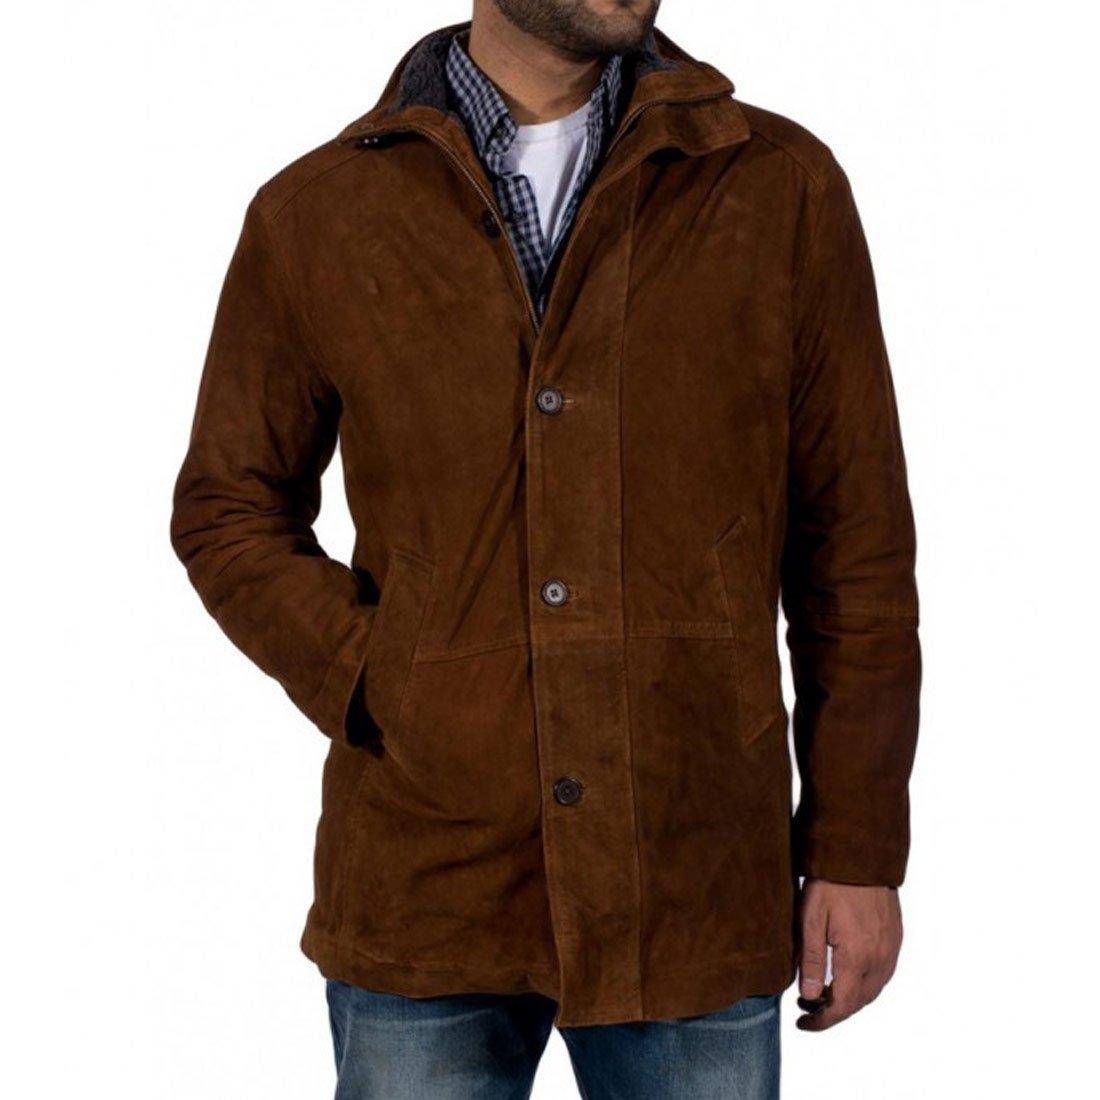 Robert Taylor Brown Suede Genuine Leather Sheriff Walt Longmire Coat Jacket The Custom Jacket